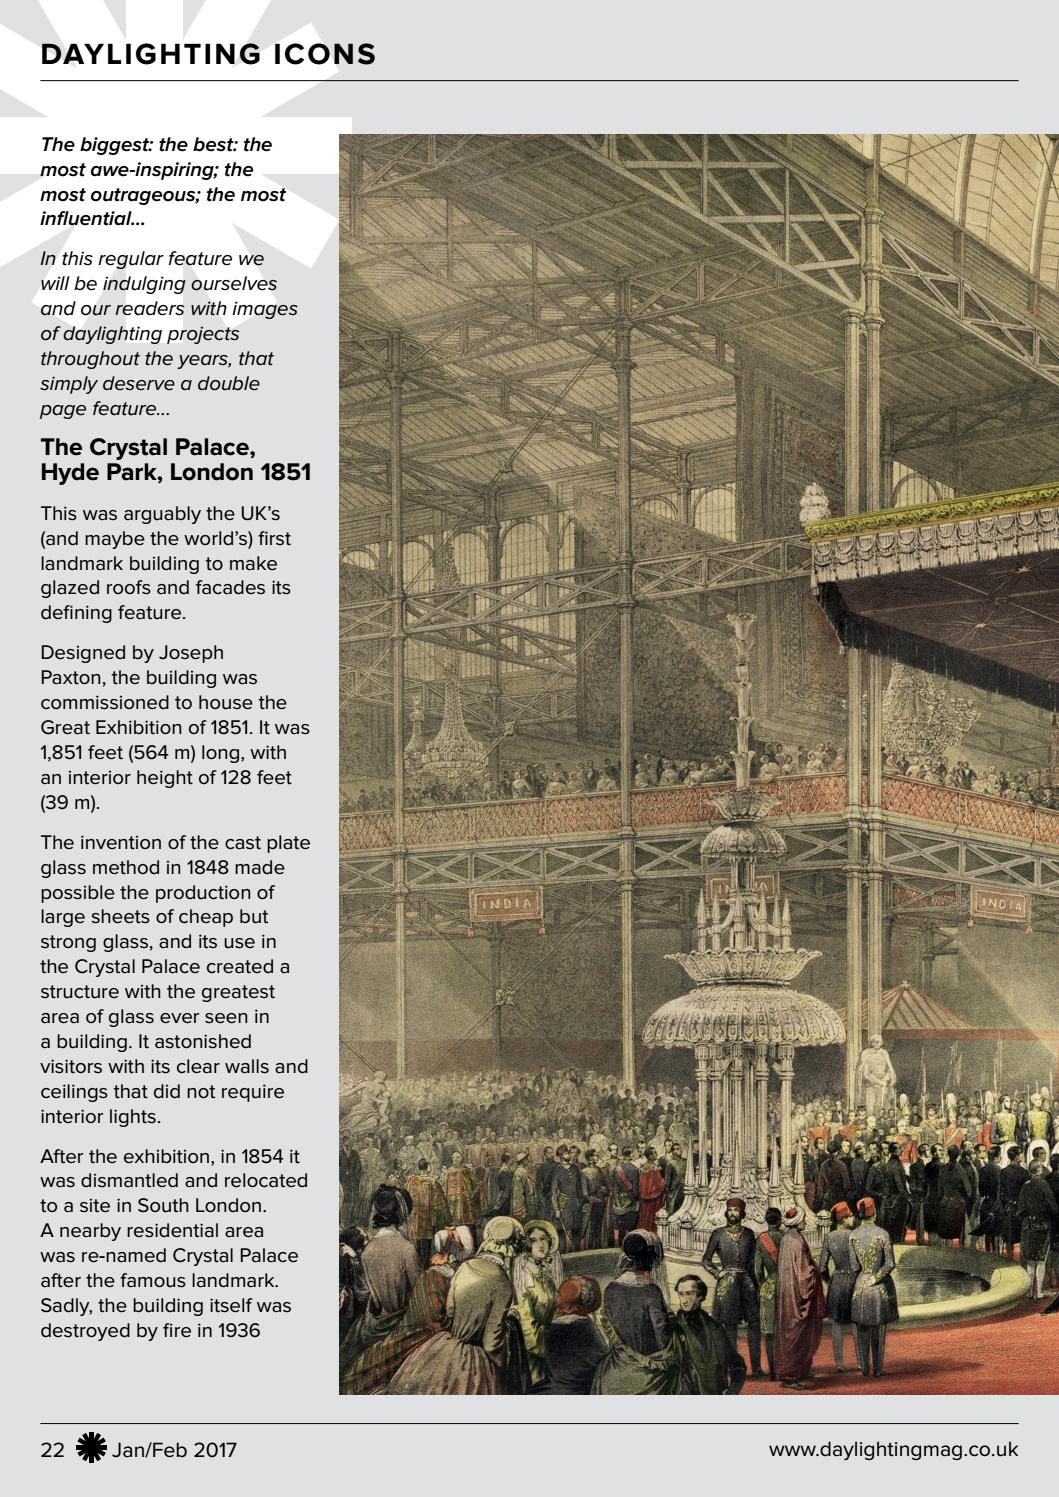 daylighting magazine issue 2 january/february 2017bb2b - issuu